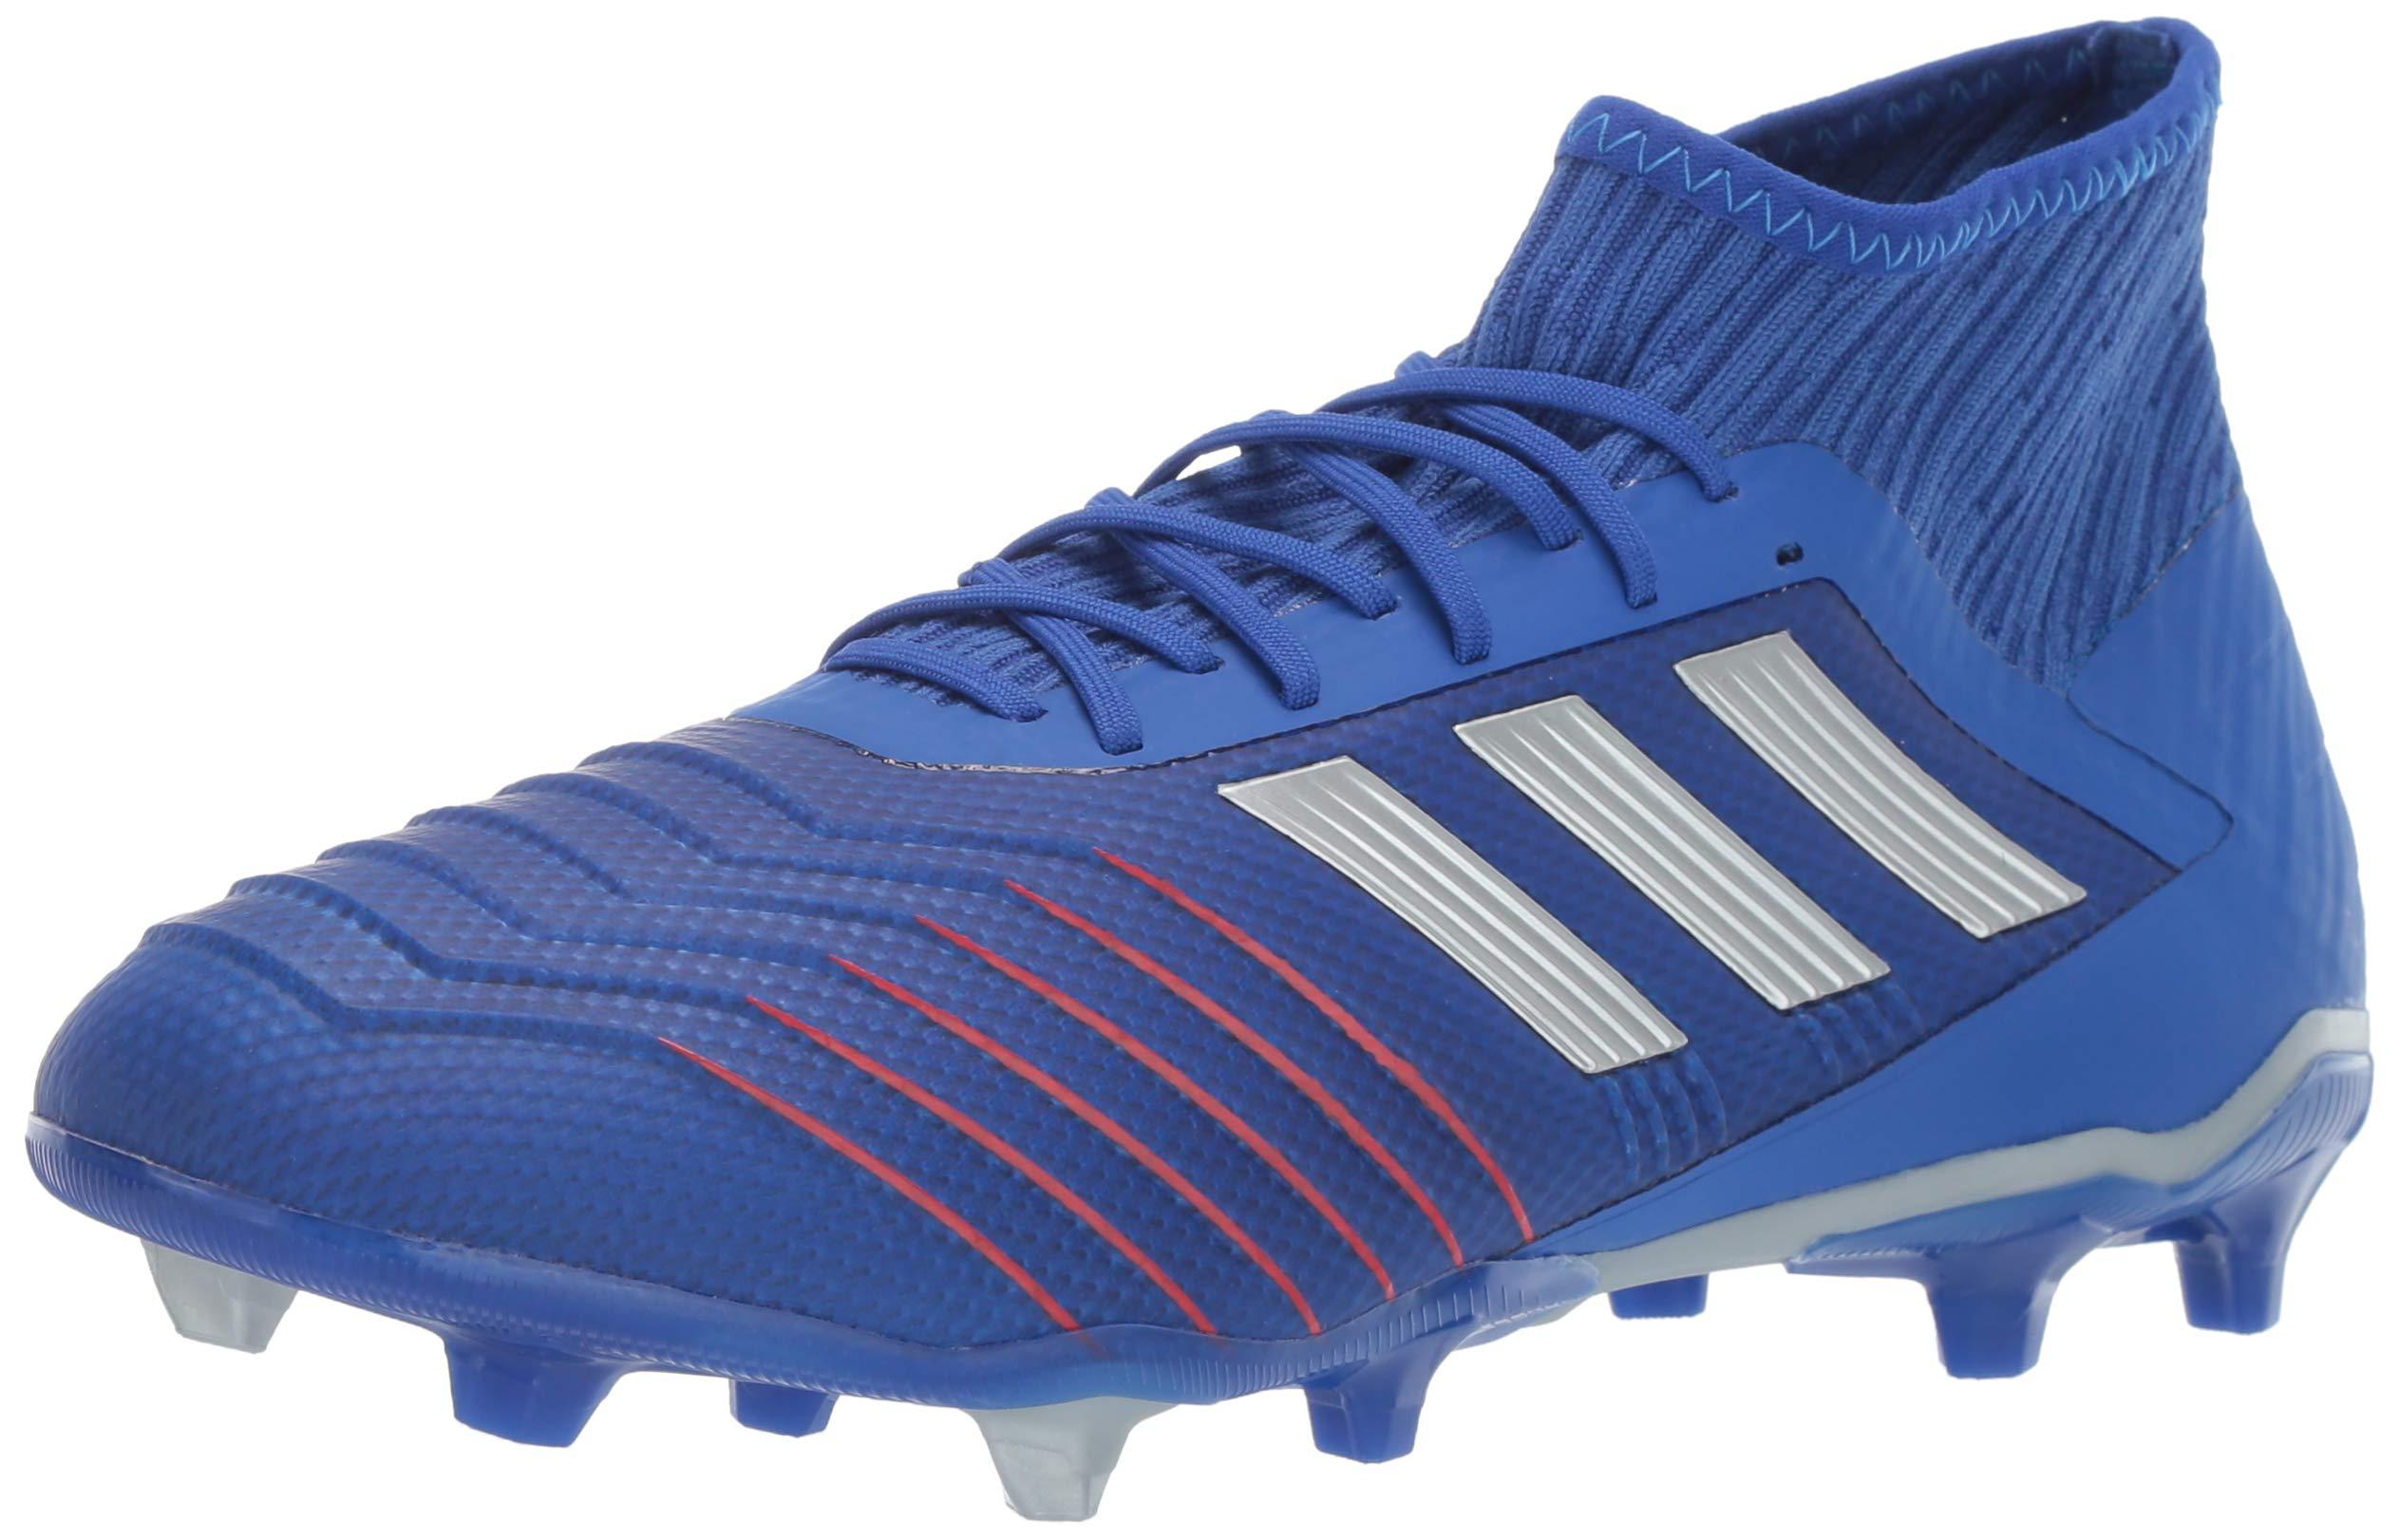 adidas Men's Predator 19.2 Firm Ground, Bold Silver Metallic/Football Blue, 6.5 M US